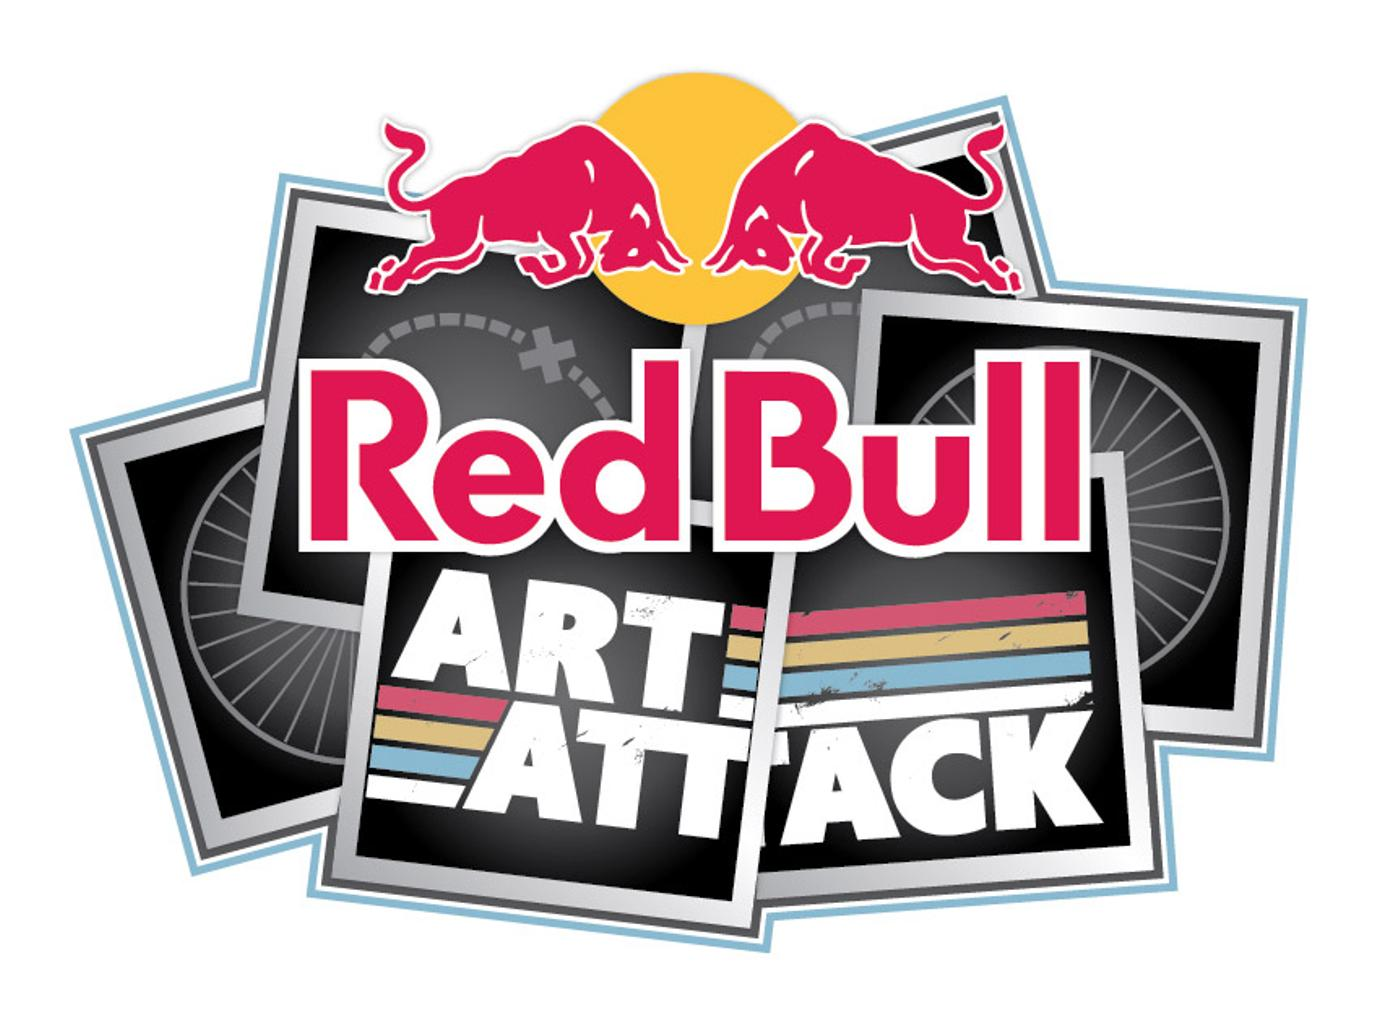 The 2012 Red Bull Art Attack NACCC Event